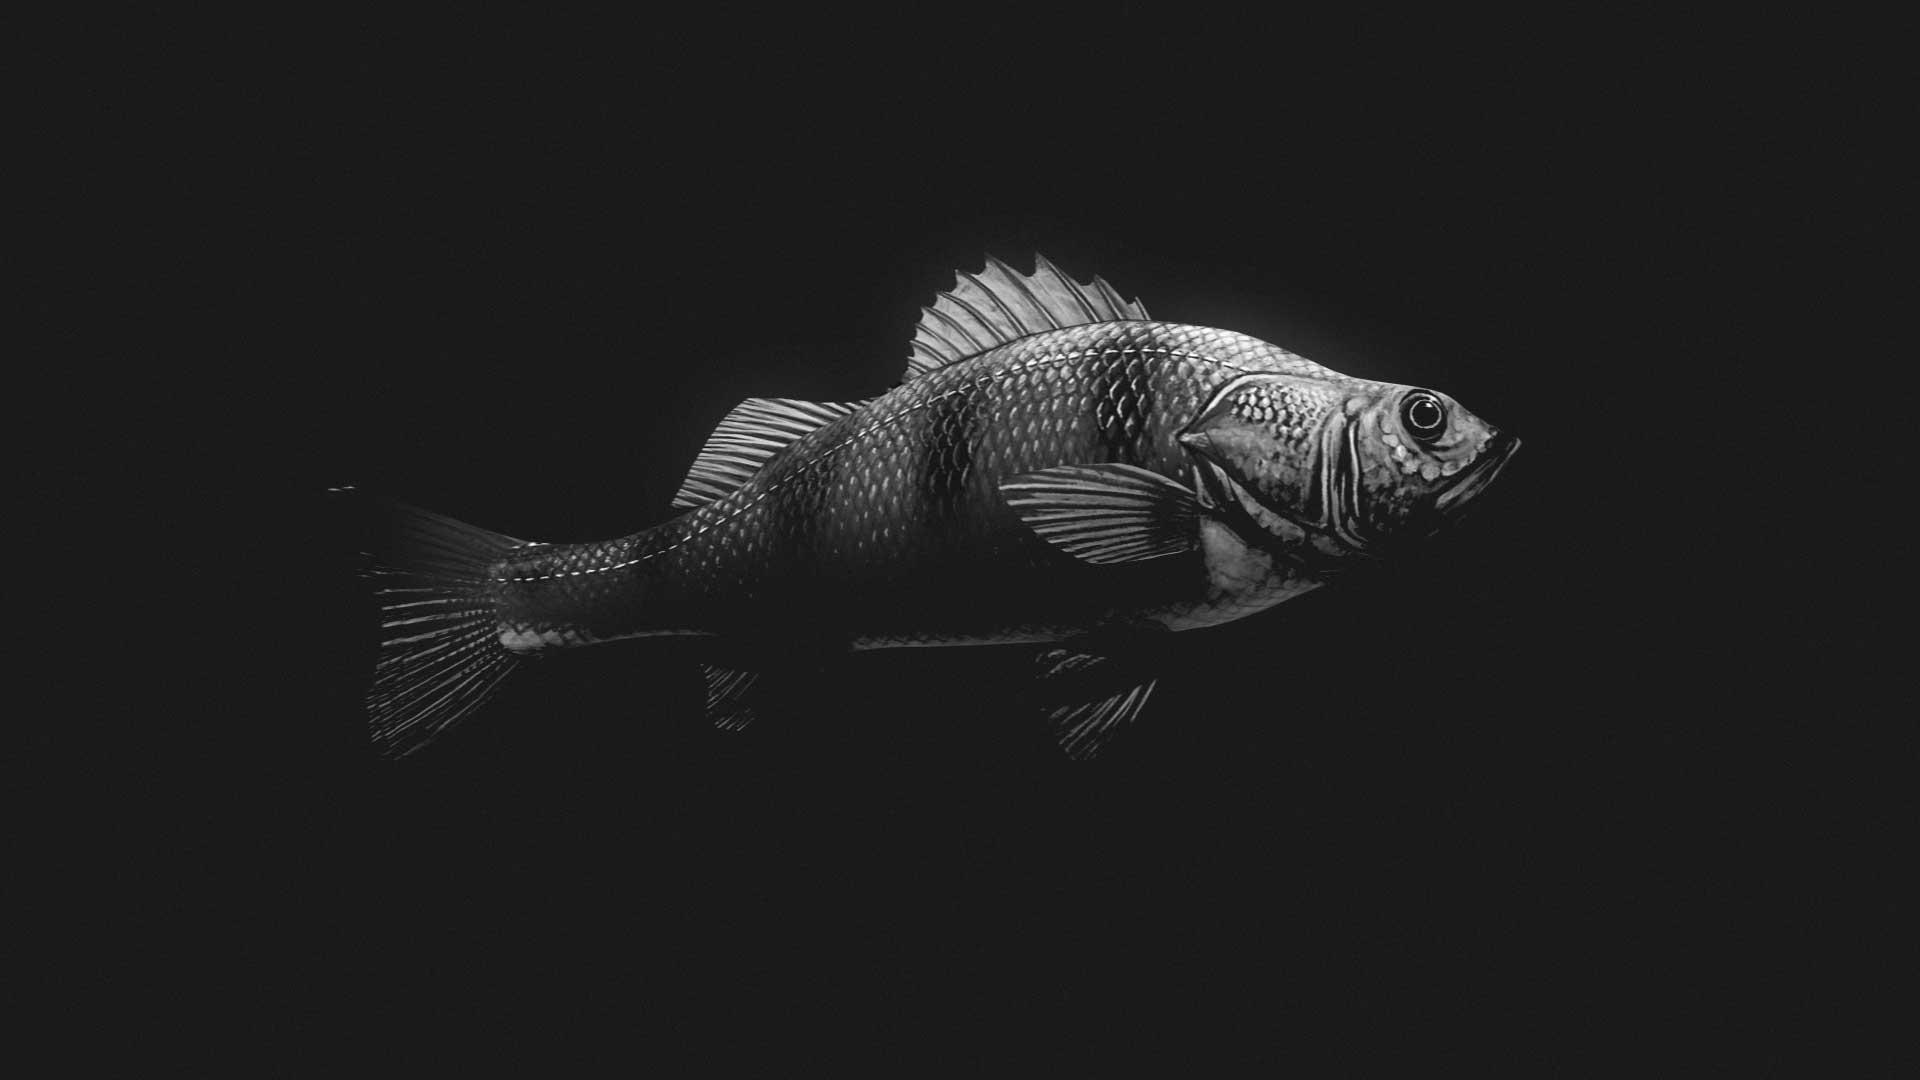 Animar-logo-peces-Pez-animarlogo